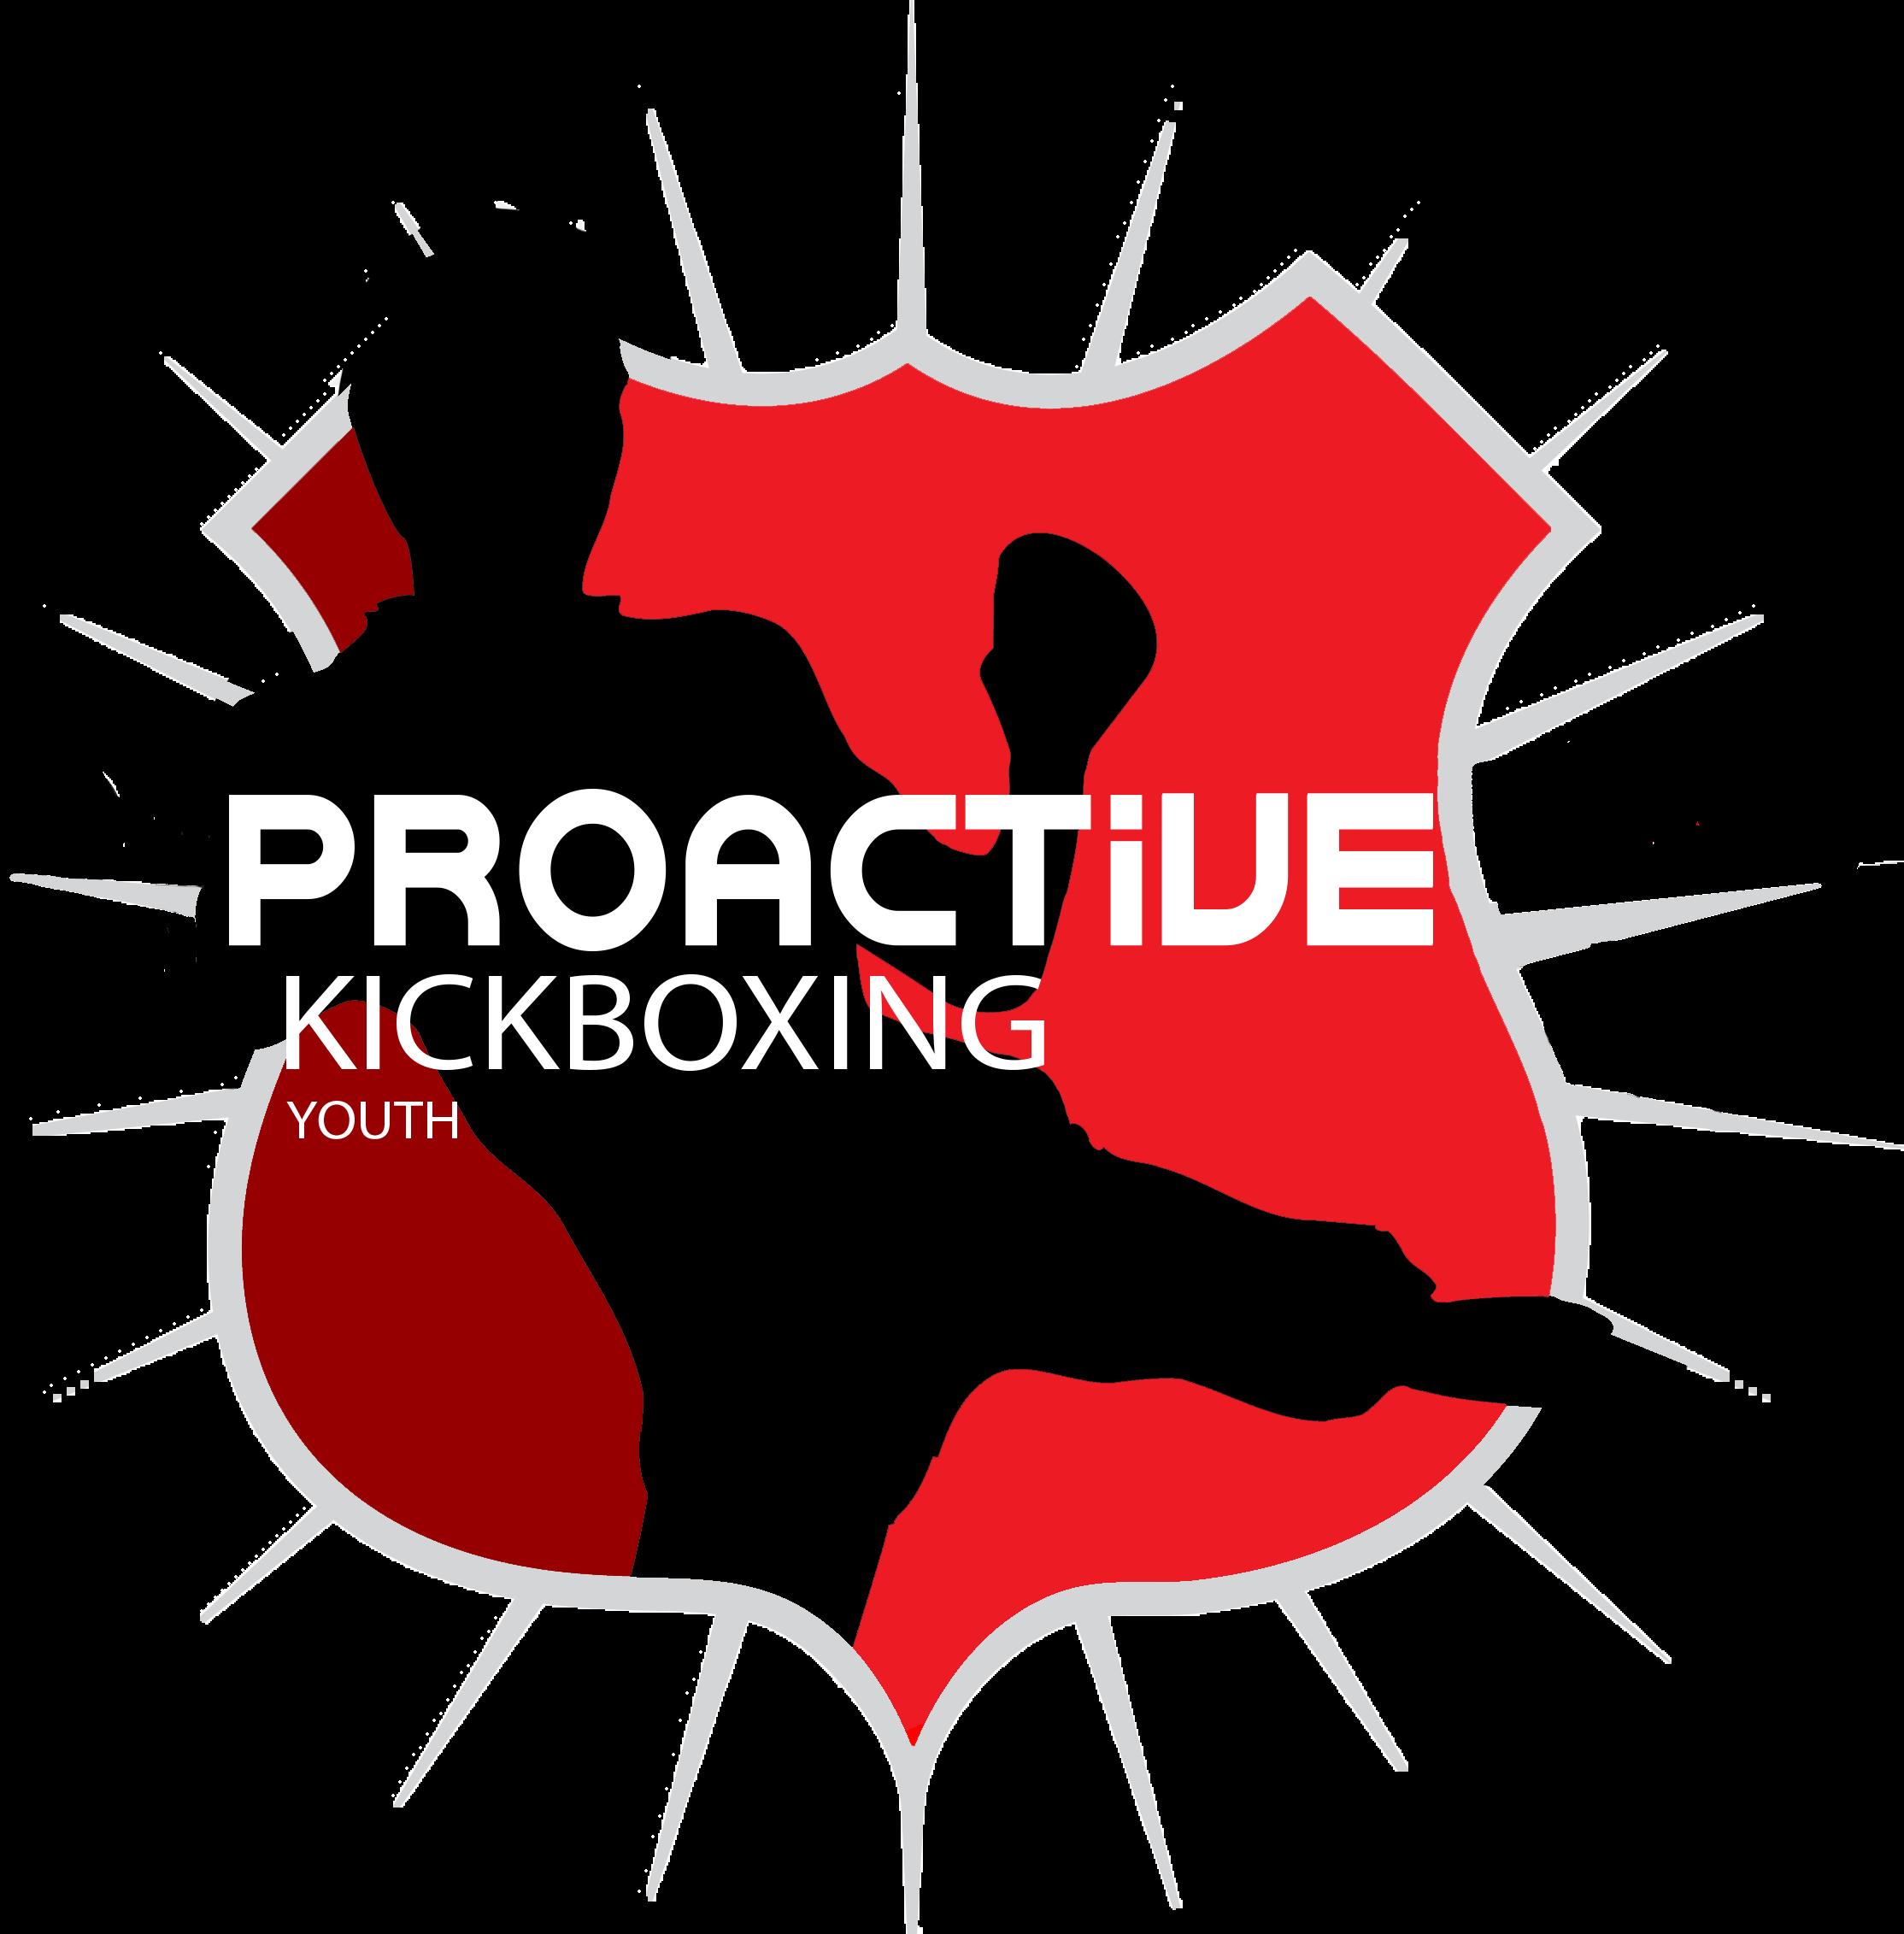 kids teens kickboxing christchurch muay thai kickboxing proactive rh selfdefence co nz kick boxing logo png kickboxing loganville georgia